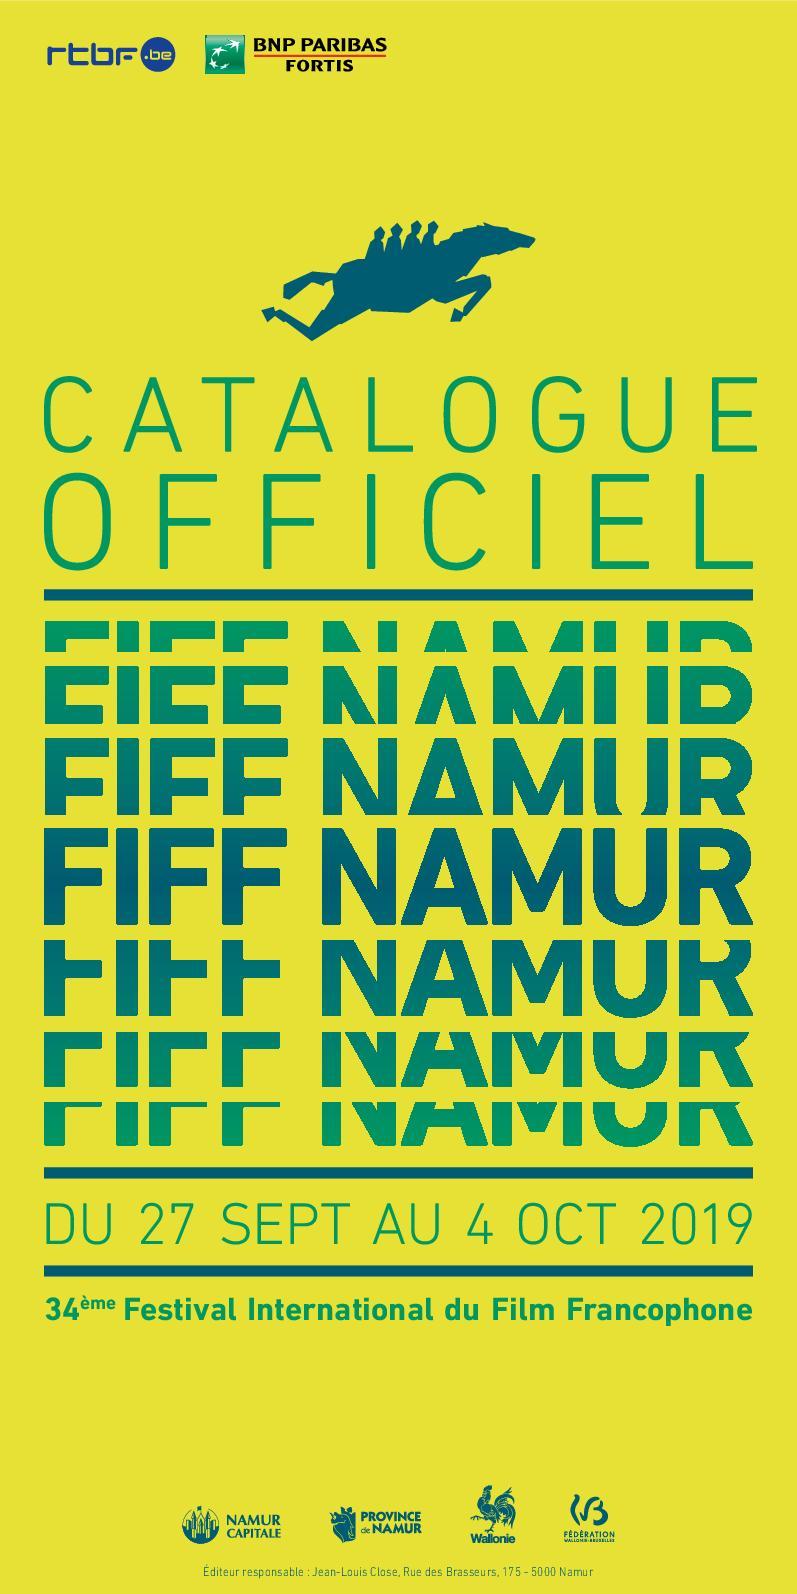 membres rencontres francophones net logout dix 2 rencontre fr